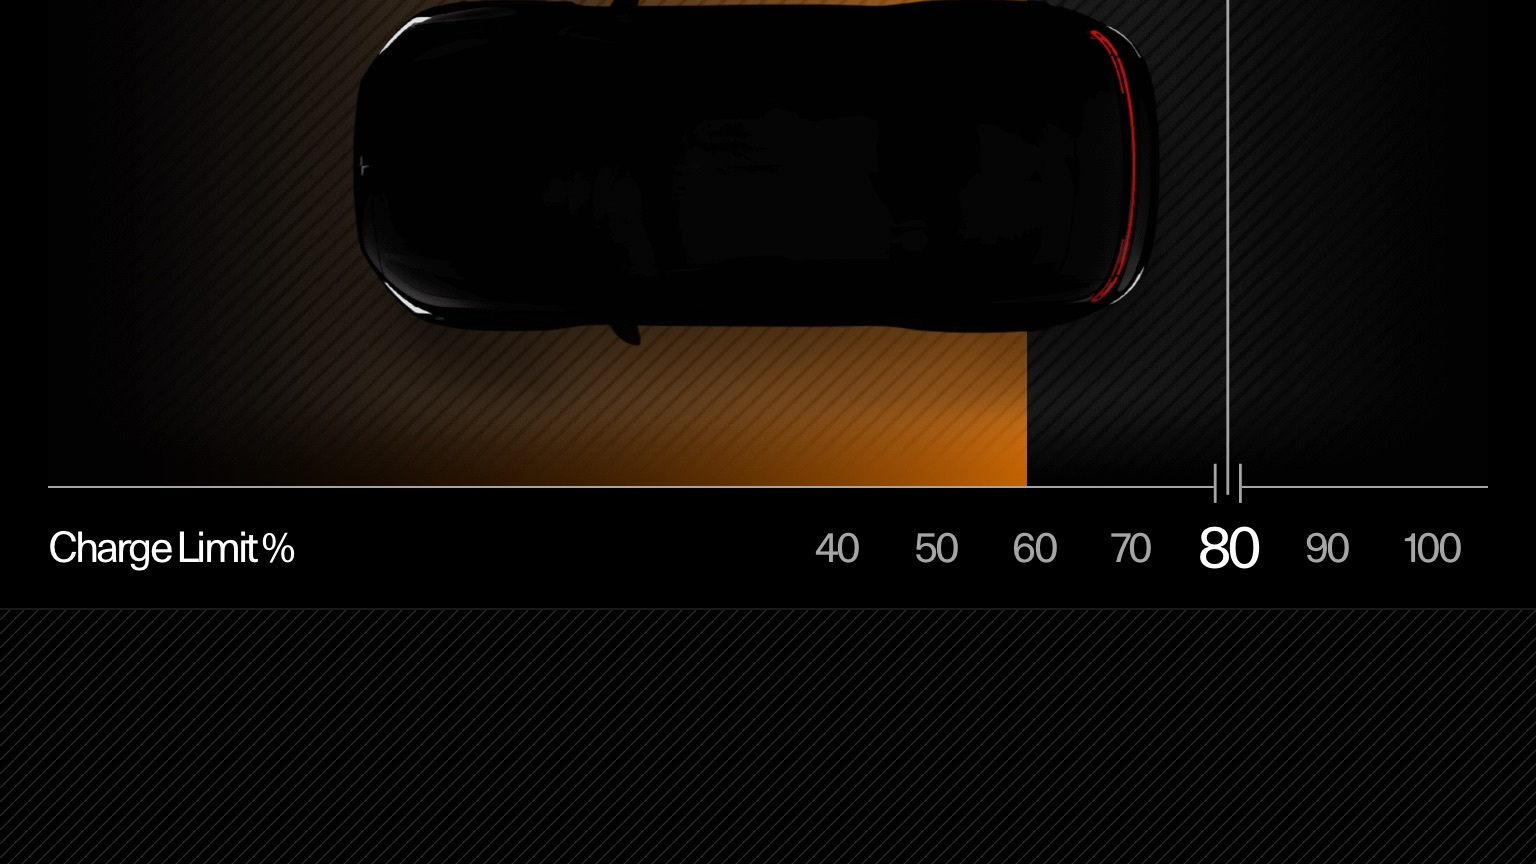 Polestar 2 Android-based infotainment system teaser image